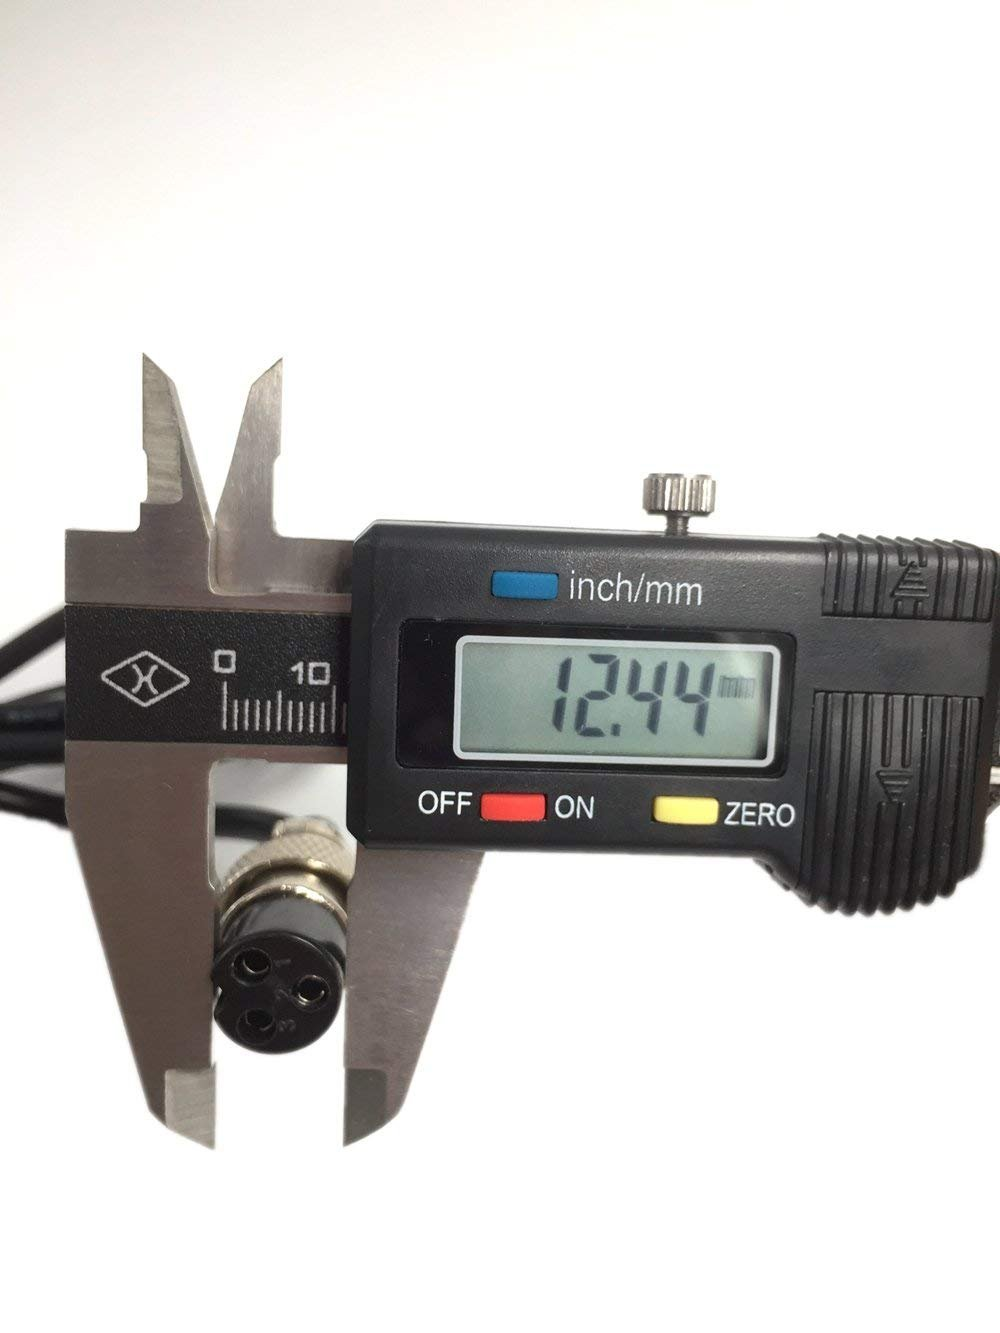 TangsFire Cargador de bater/ía de litio para Ebike Powerboard Mini 3 dientes, m/áx. 42 V, 2 A